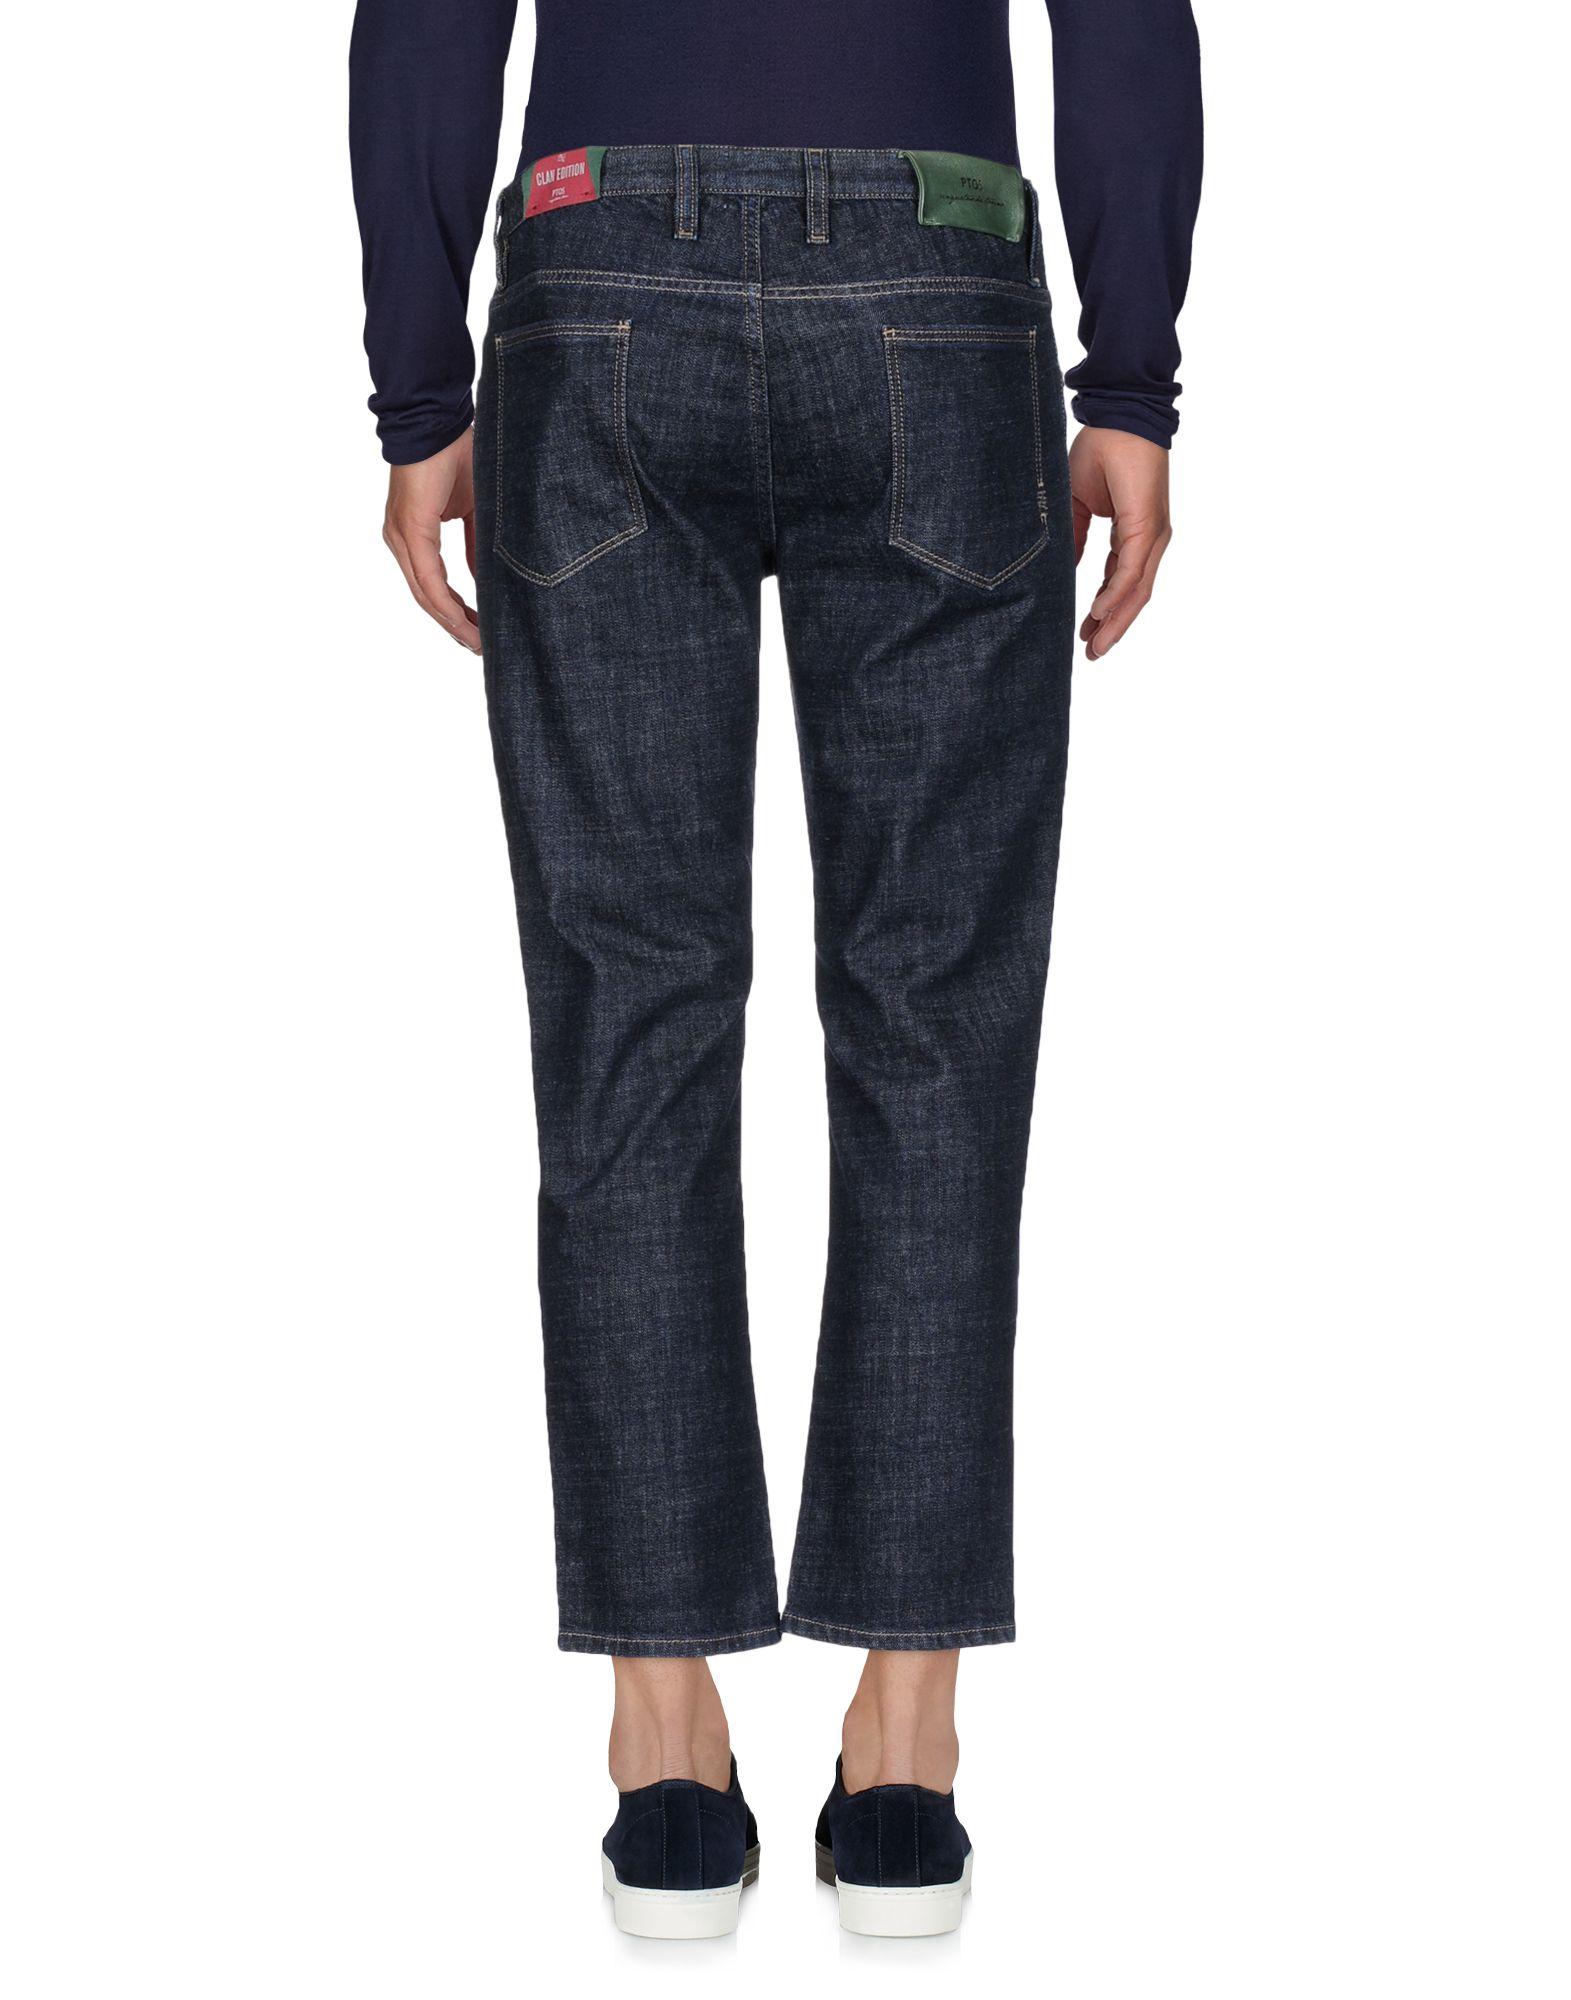 Pantaloni Jeans Pt05 Uomo Uomo Pt05 - 42669863MP 960d16